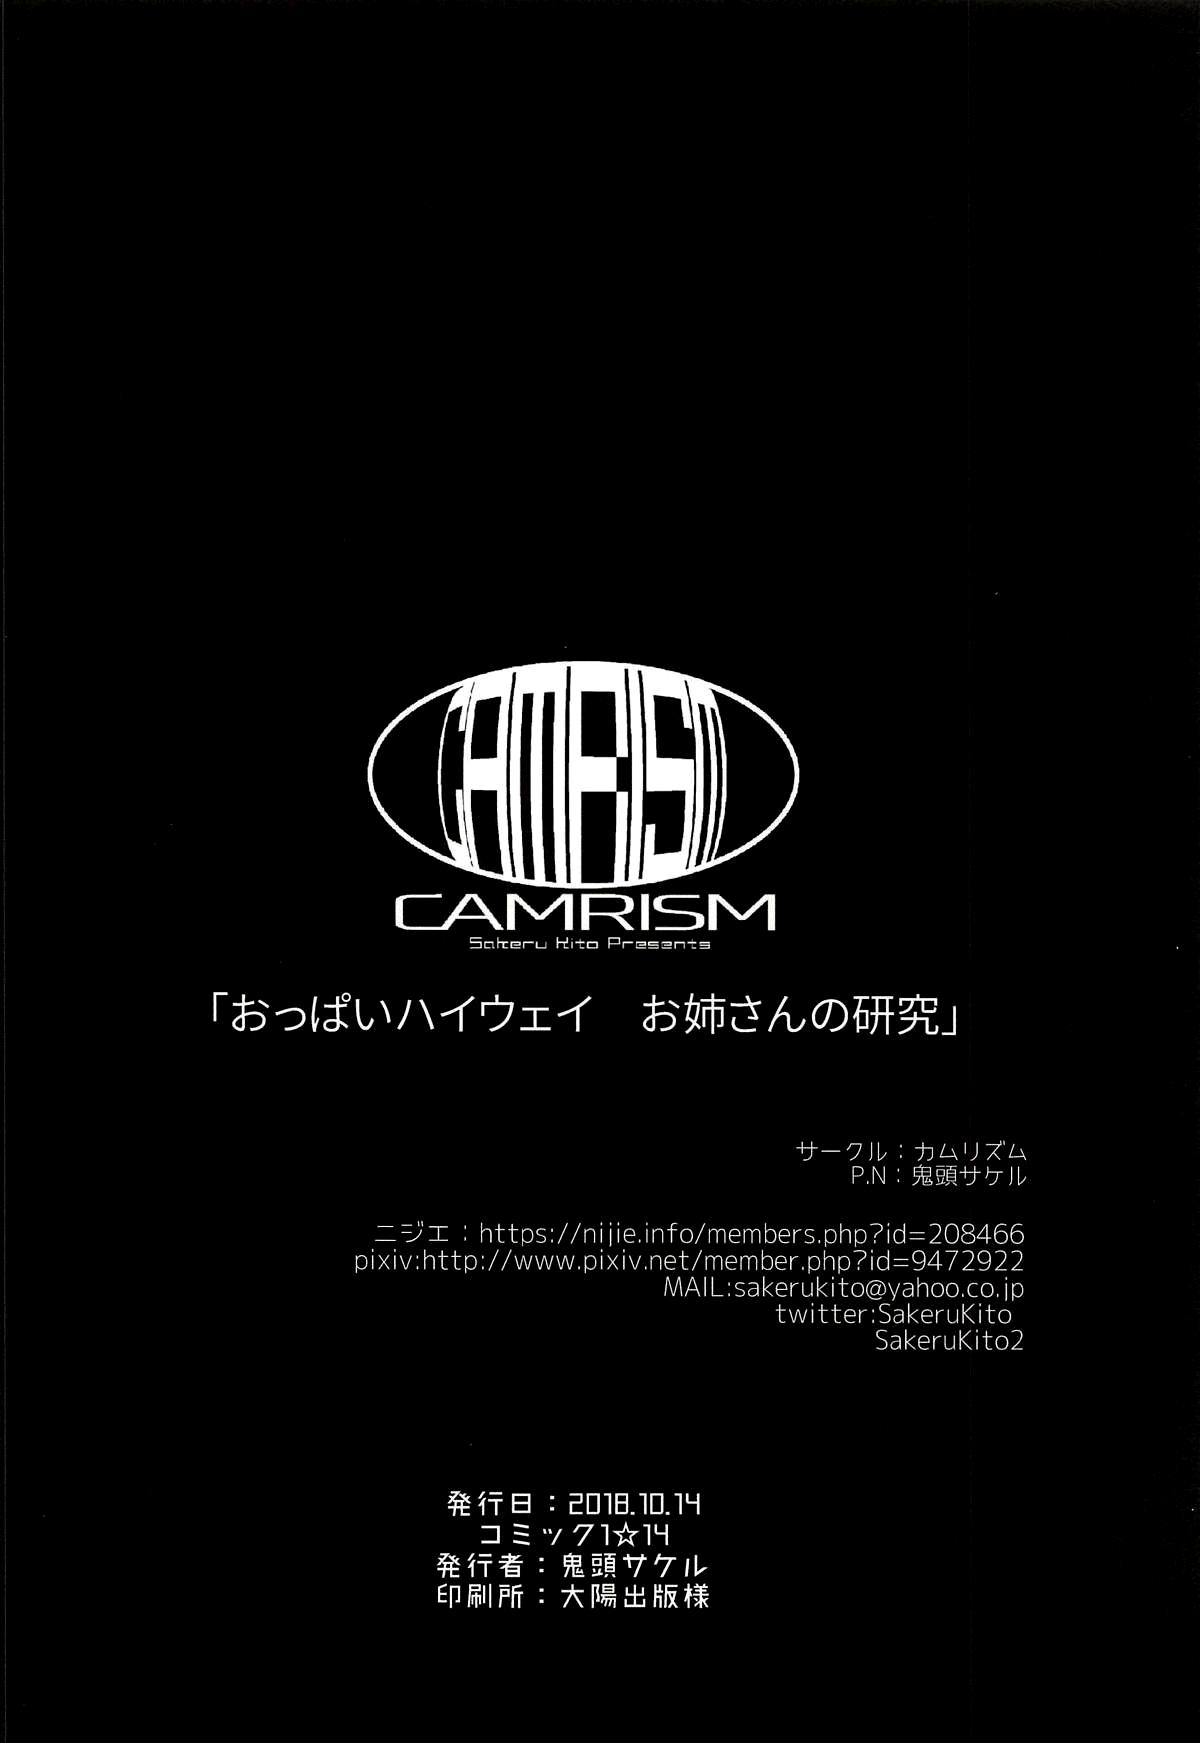 (COMIC1☆14) [Camrism (Kito Sakeru)] Oppai Highway - Onee-san no Kenkyuu (Penguin Highway) [English] [Kaijuko] 24